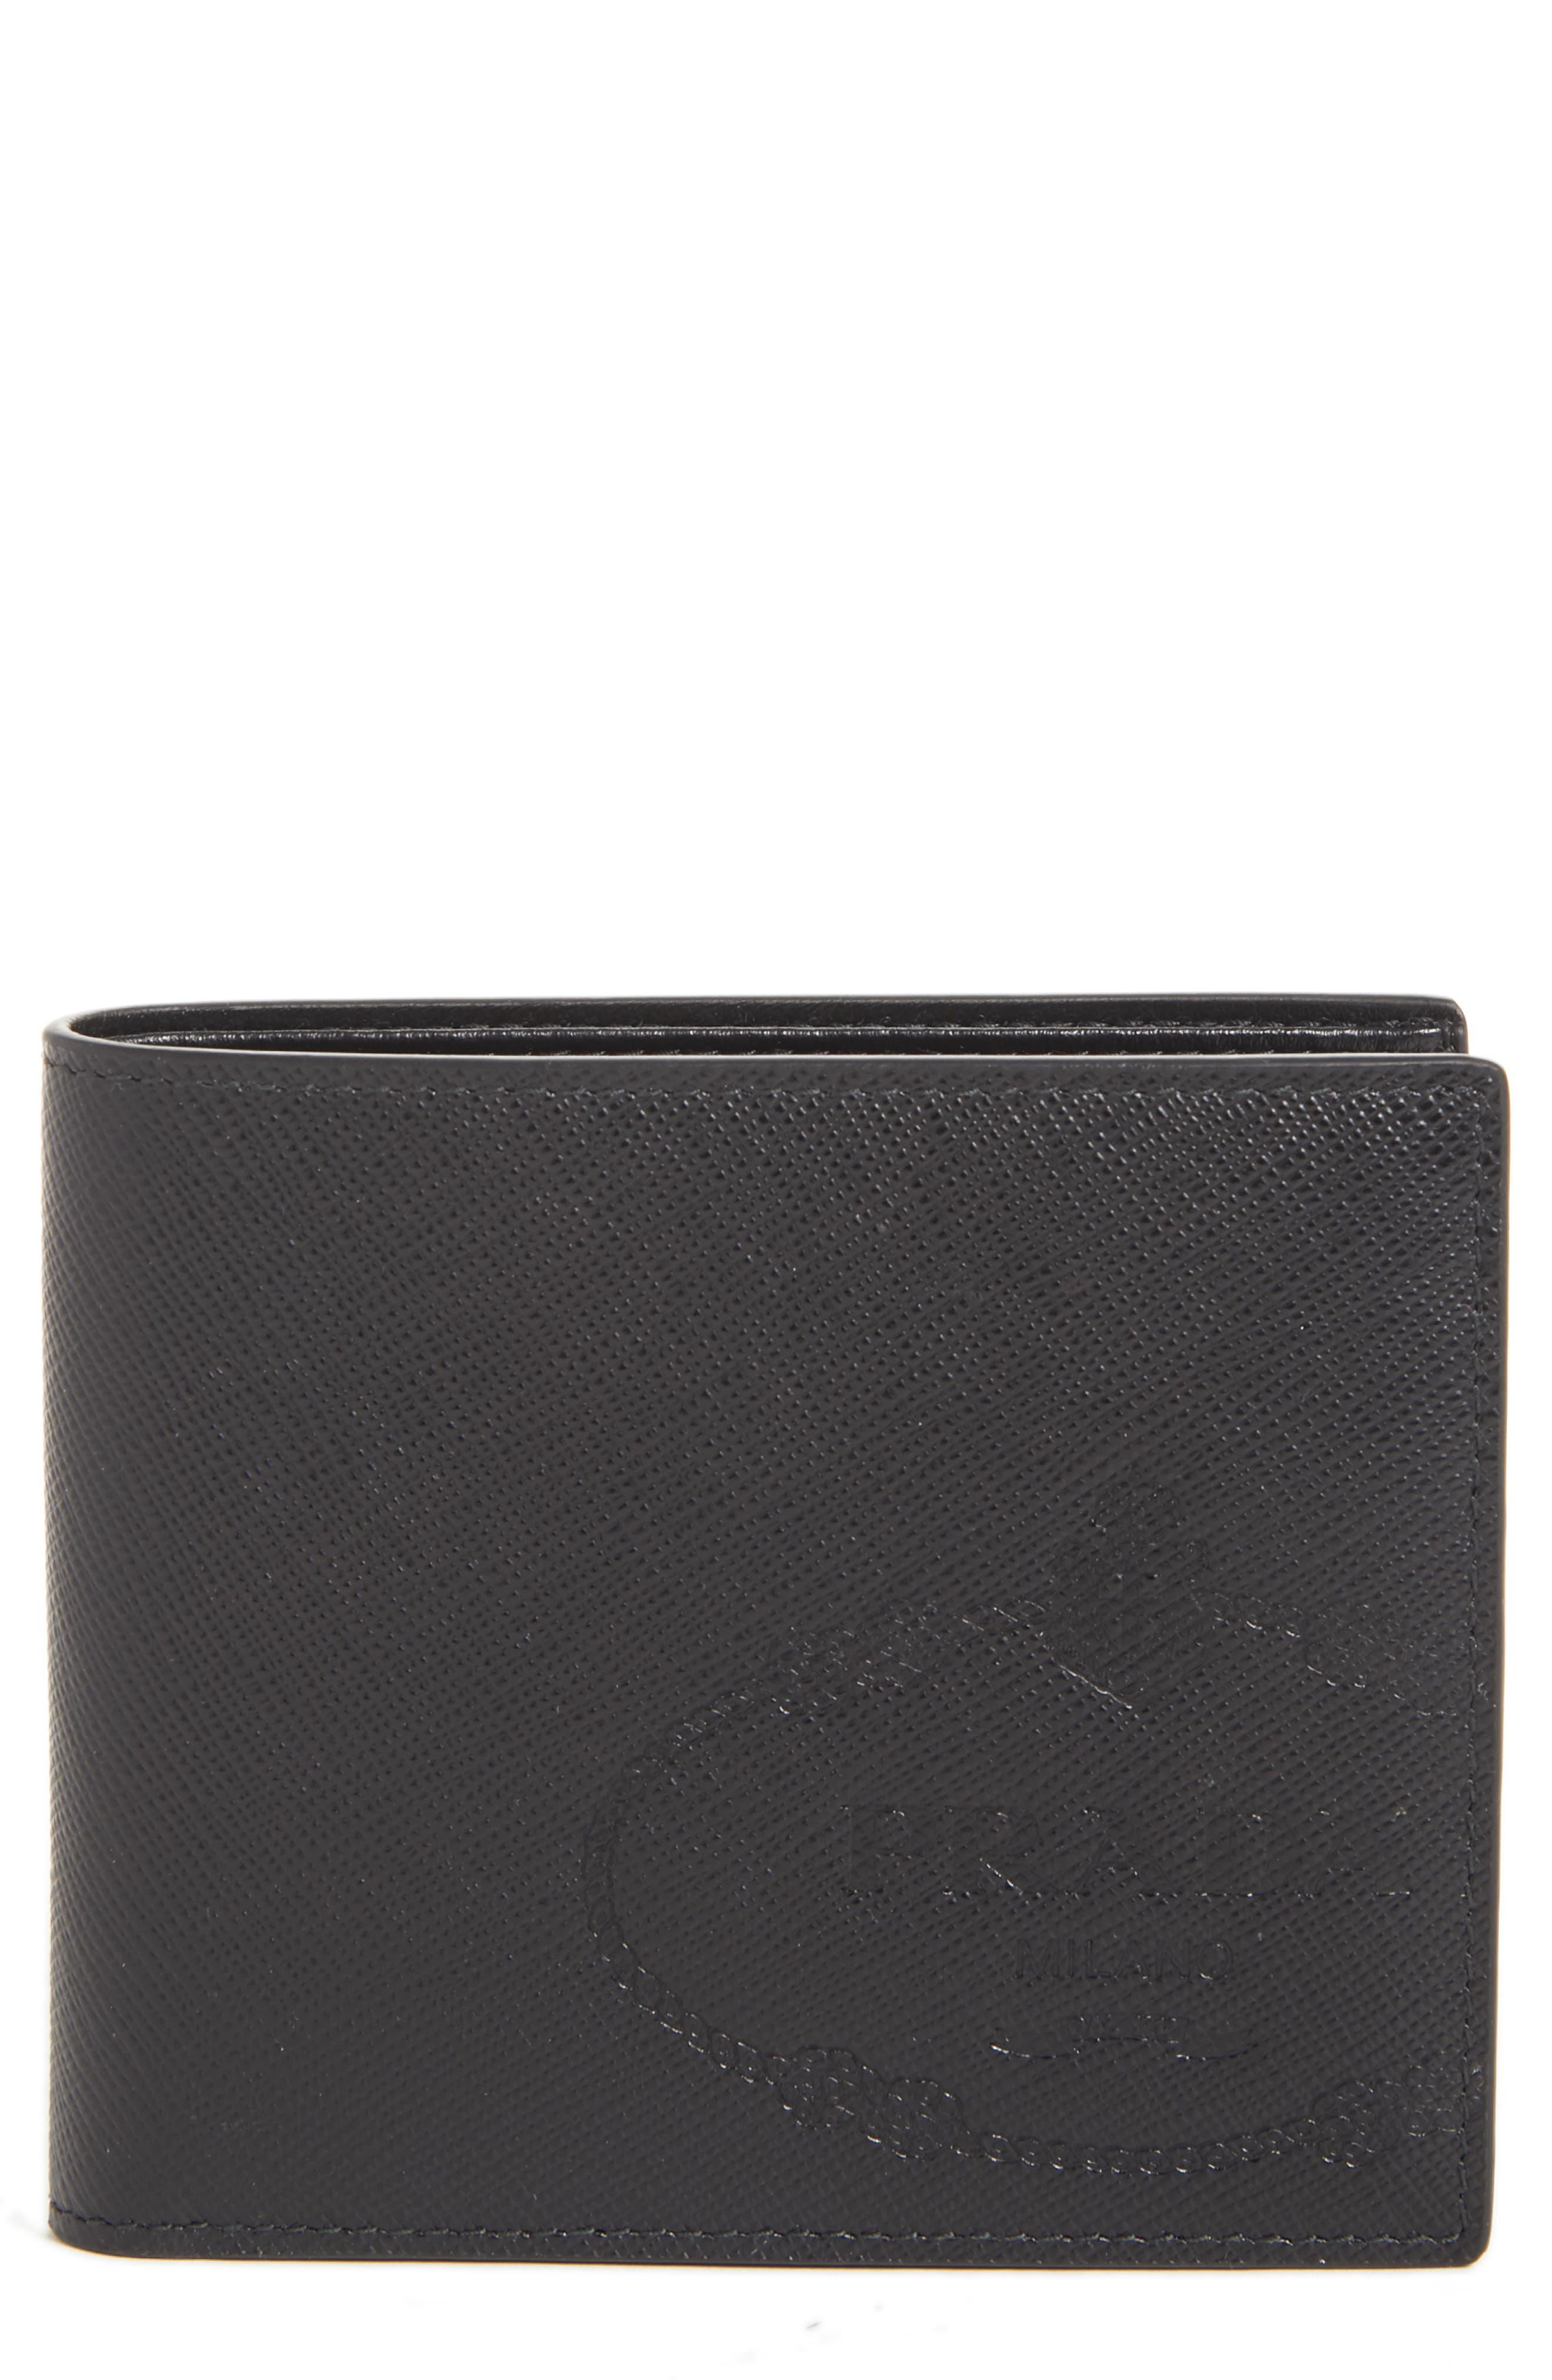 Saffiano Leather Bifold Wallet,                             Main thumbnail 1, color,                             BLACK